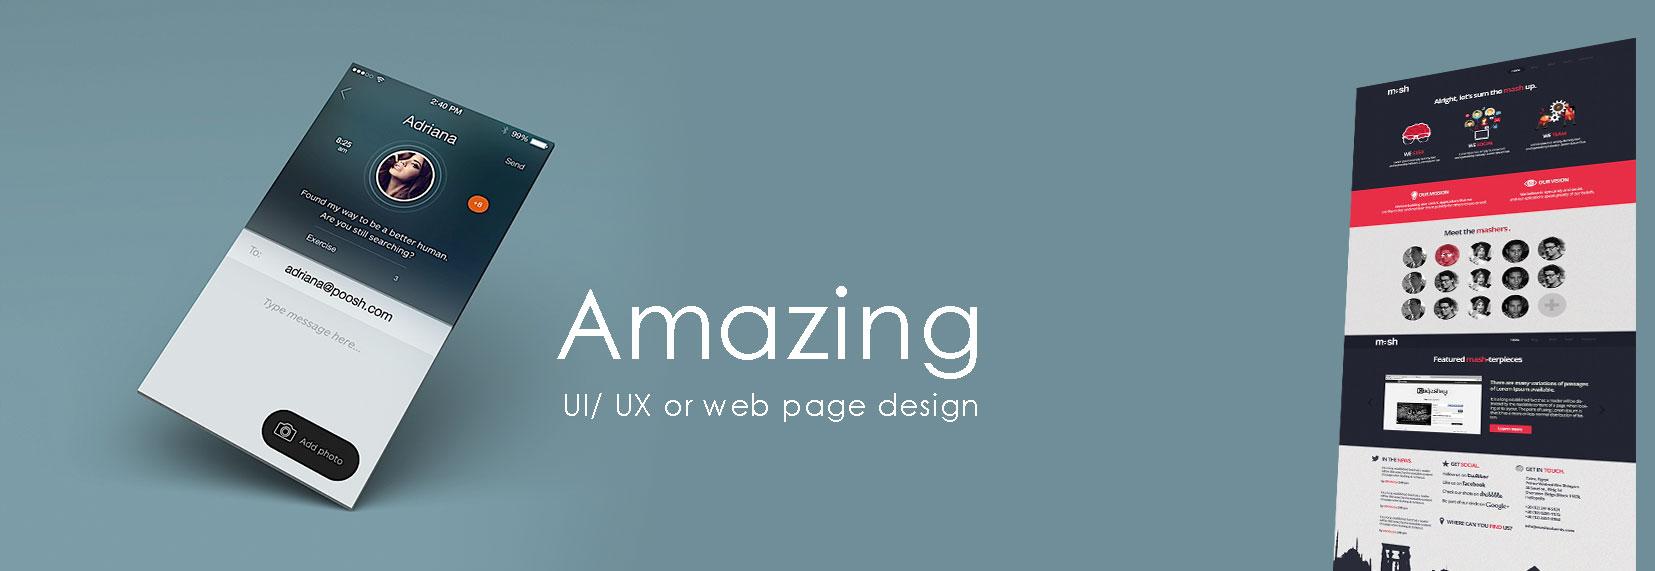 Amazing UI/ UX or web page design